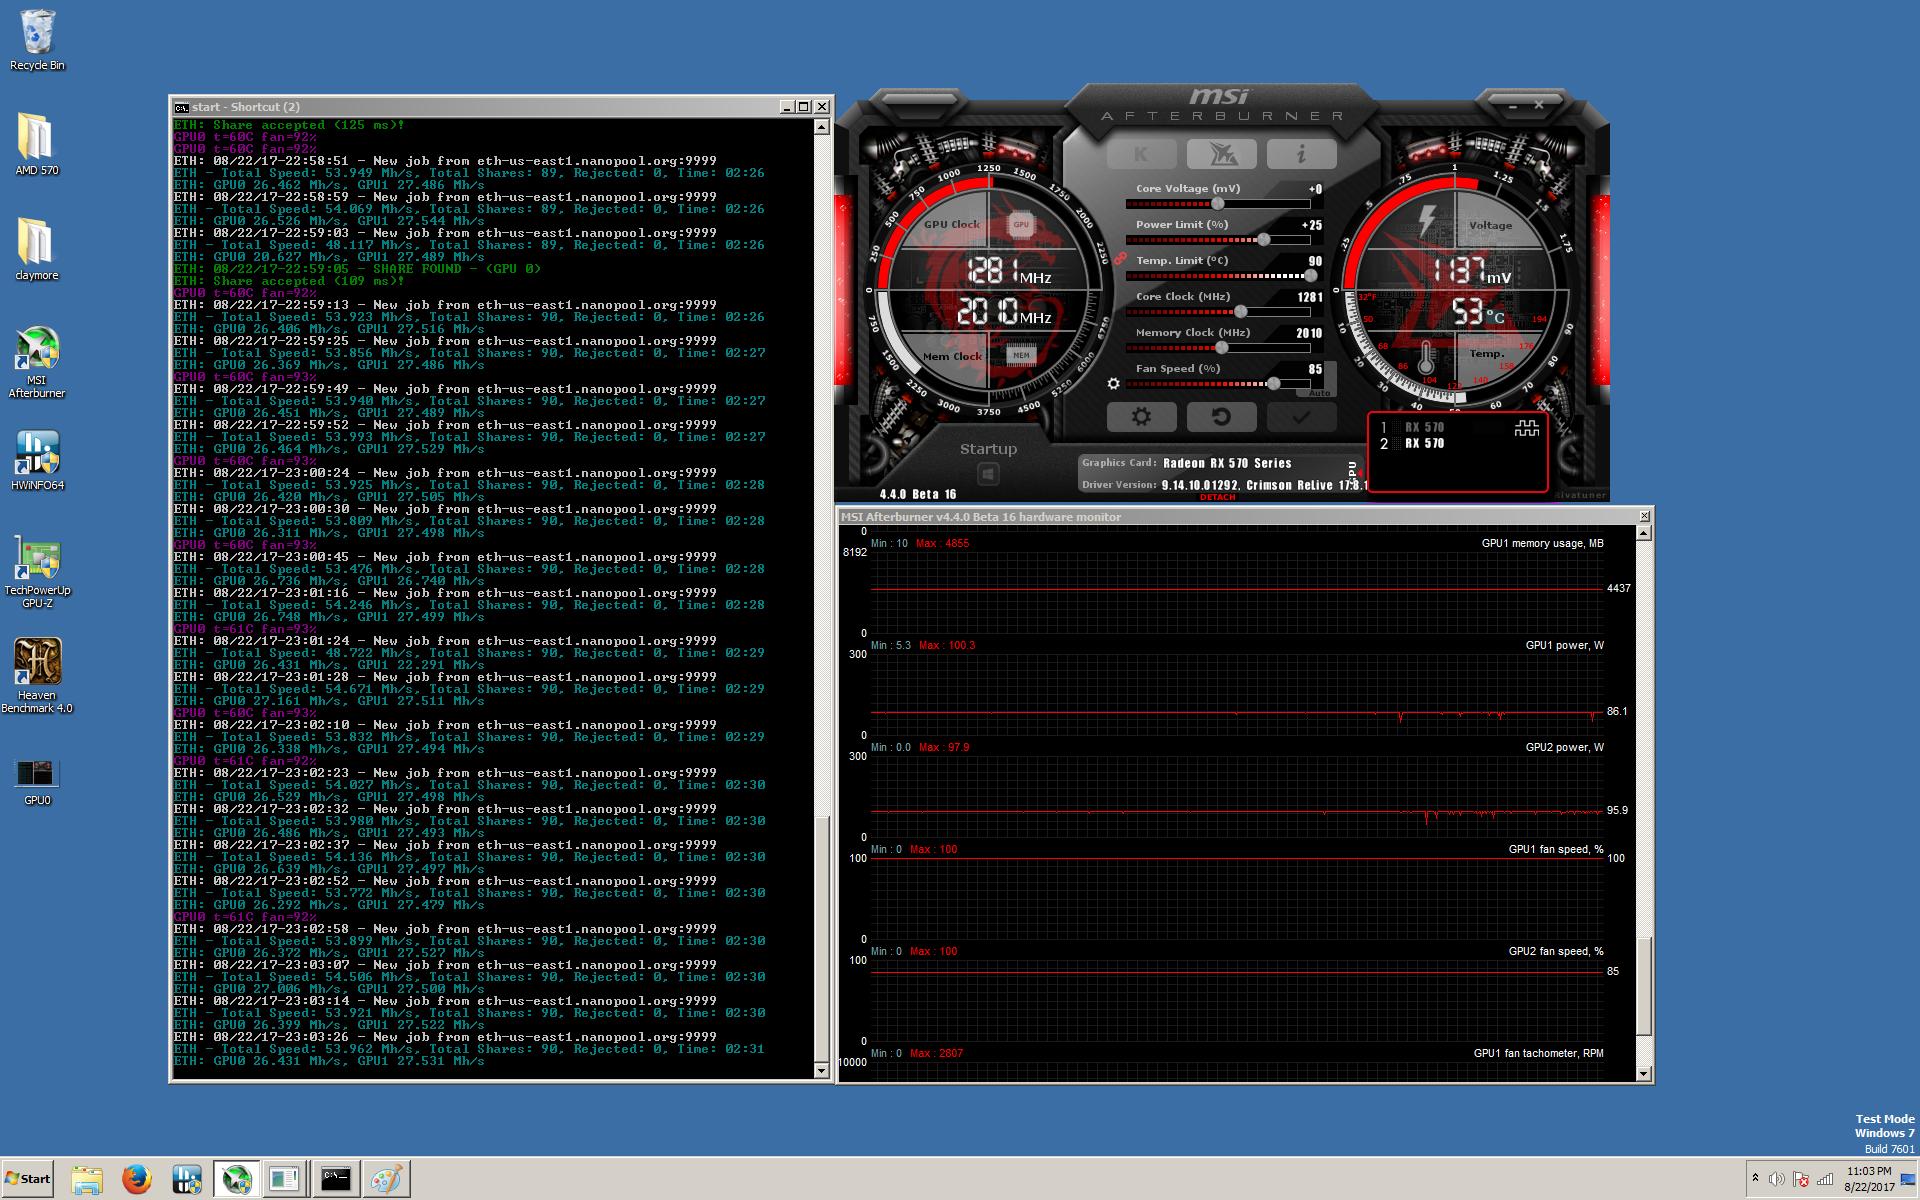 Radeon MSI RX570 4 GB ARMOR OC - MSI Afterburner not working